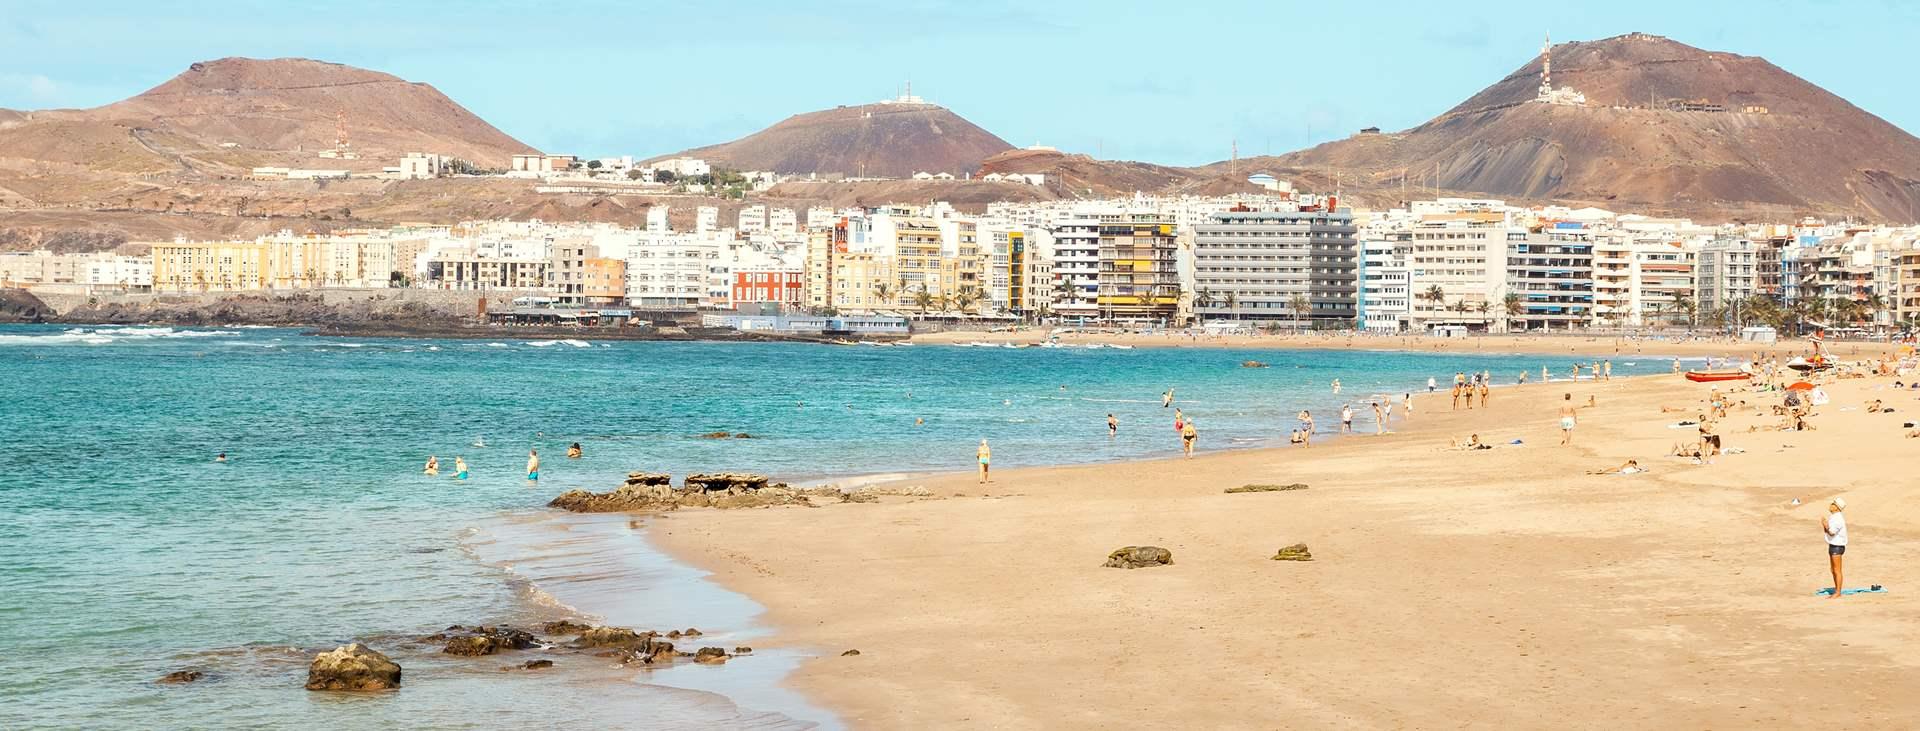 Drar til Gran Canaria på ferie - YouTube